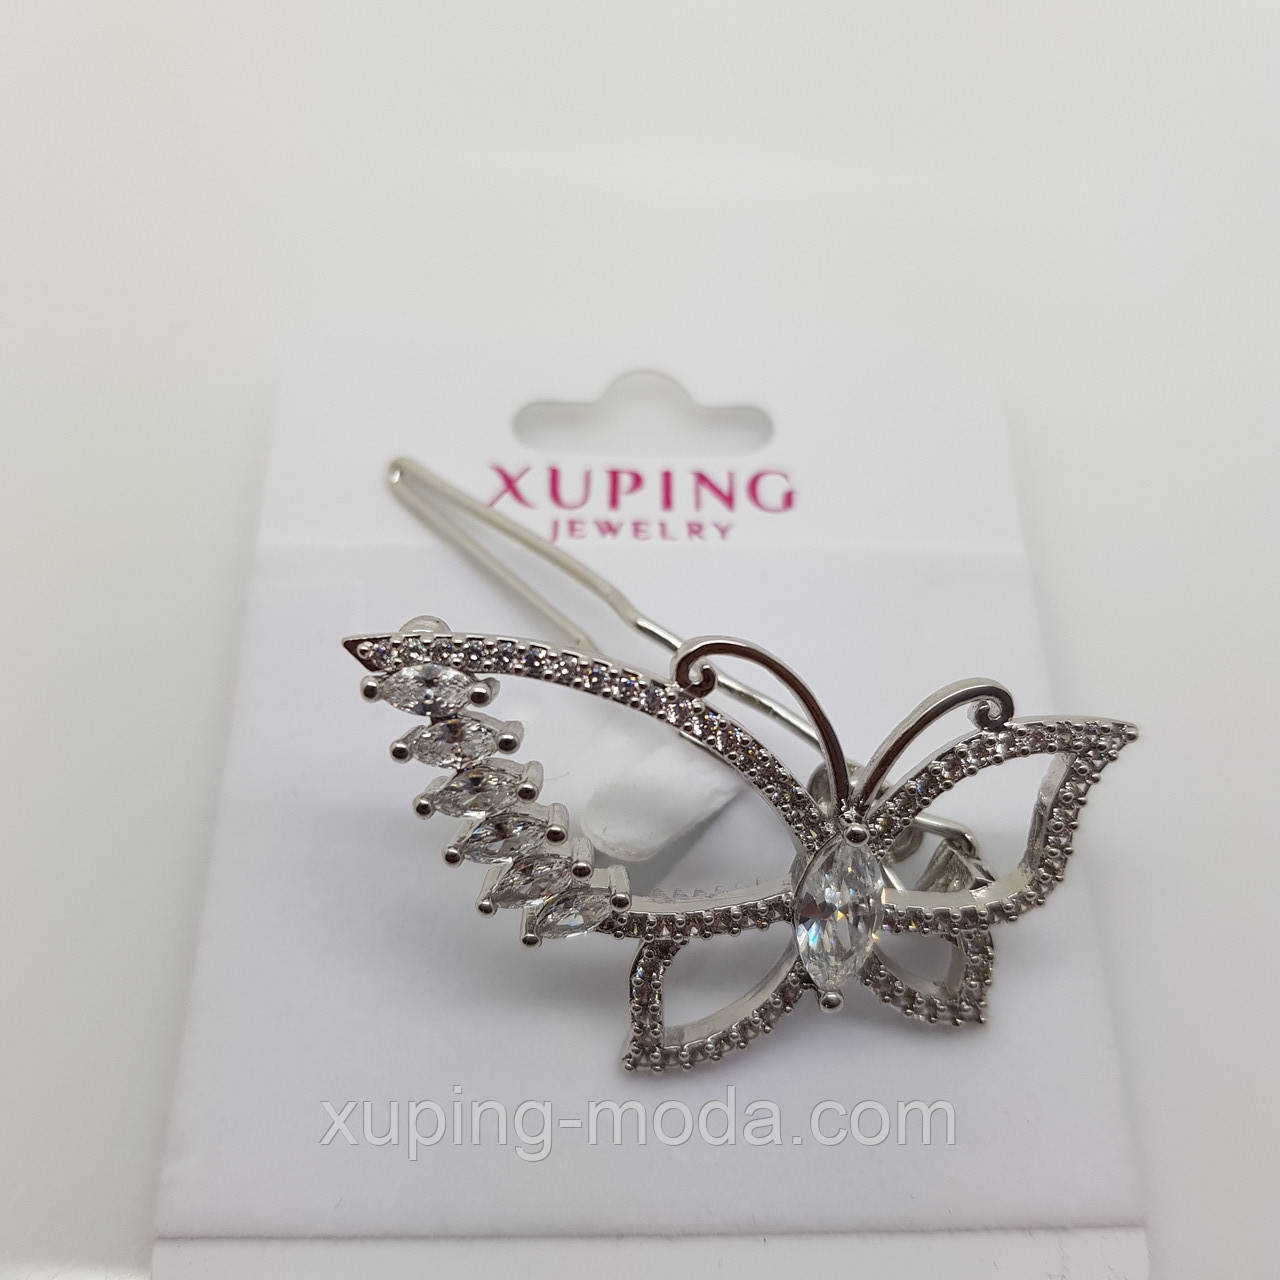 Заколка xuping, в виде бабочки, под серебро